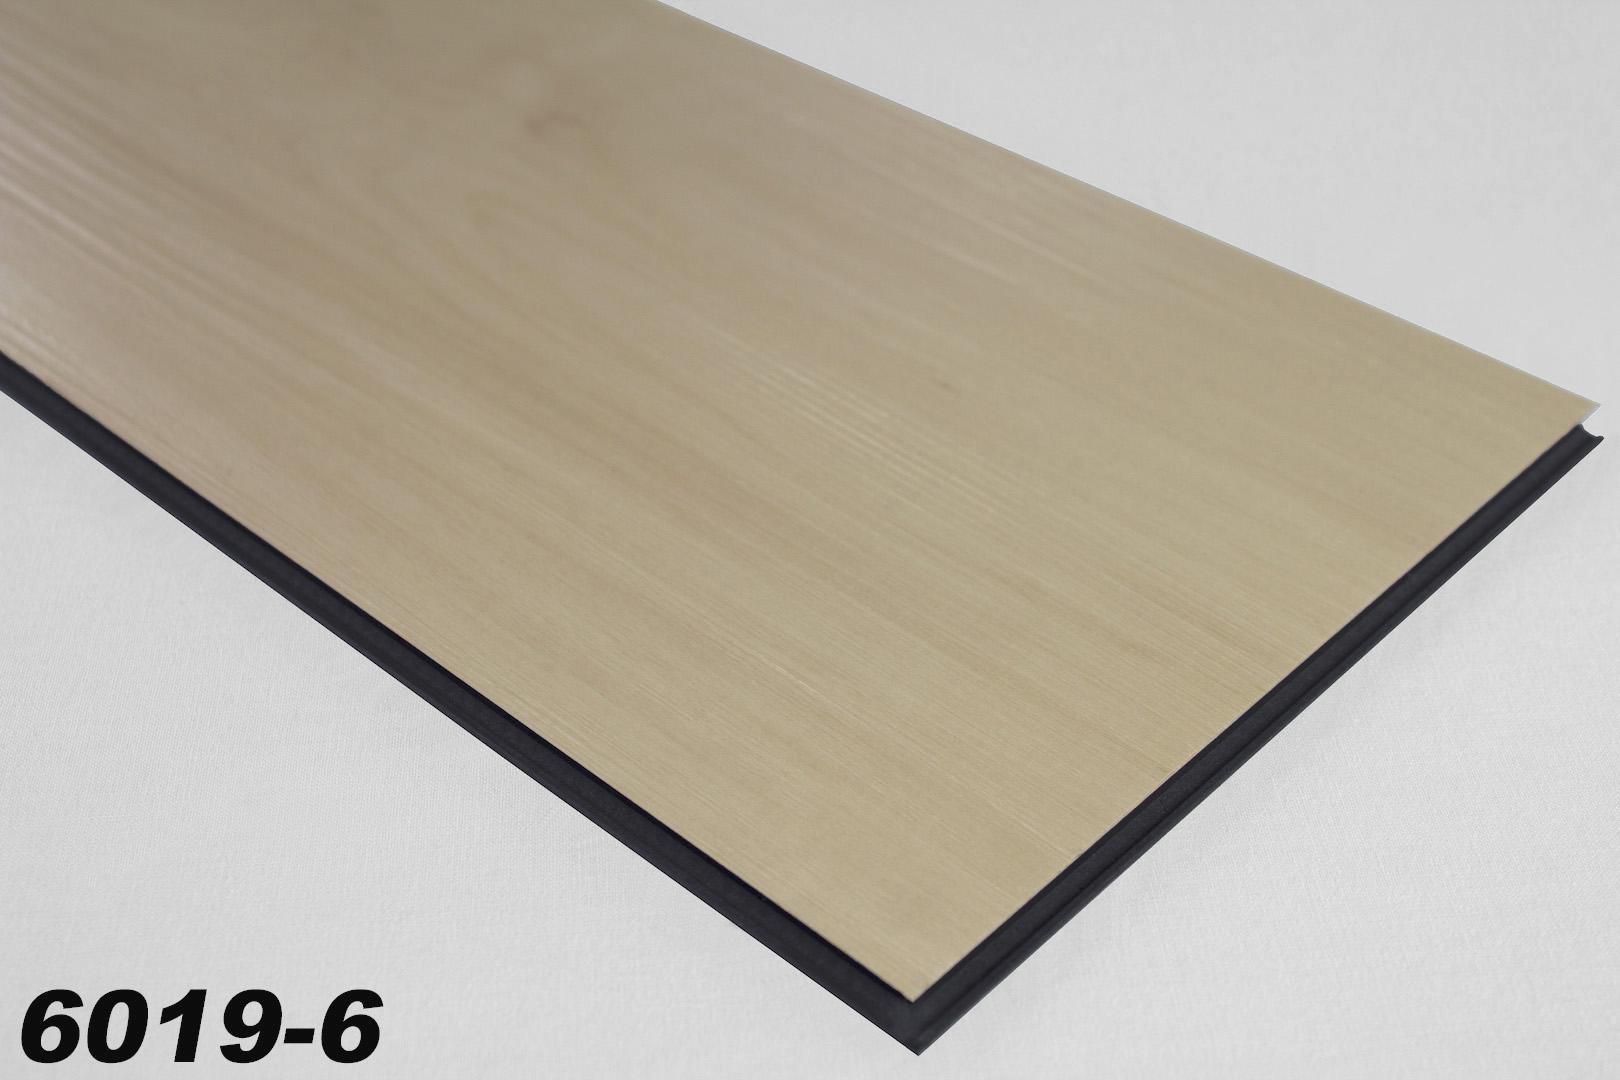 69,96 m² Vinylboden in 4,2mm Uniclic PVC-Bodenbelag Nutzschicht 0,3mm, 6019-6